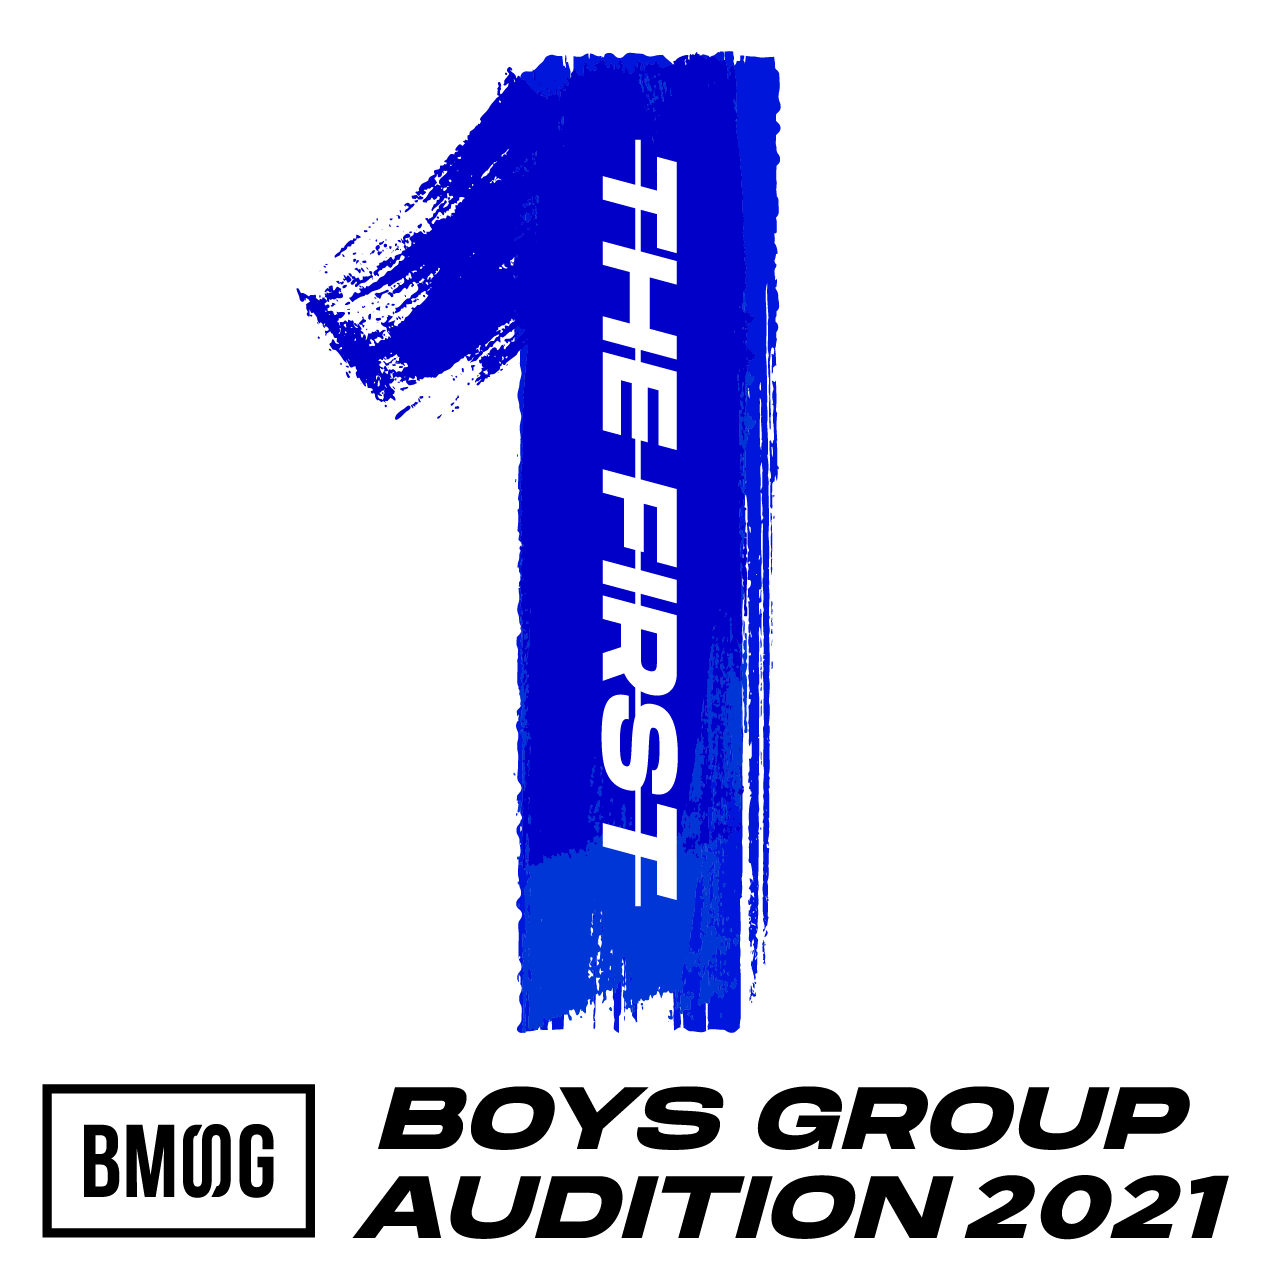 BMSG Audition 2021 ロゴ